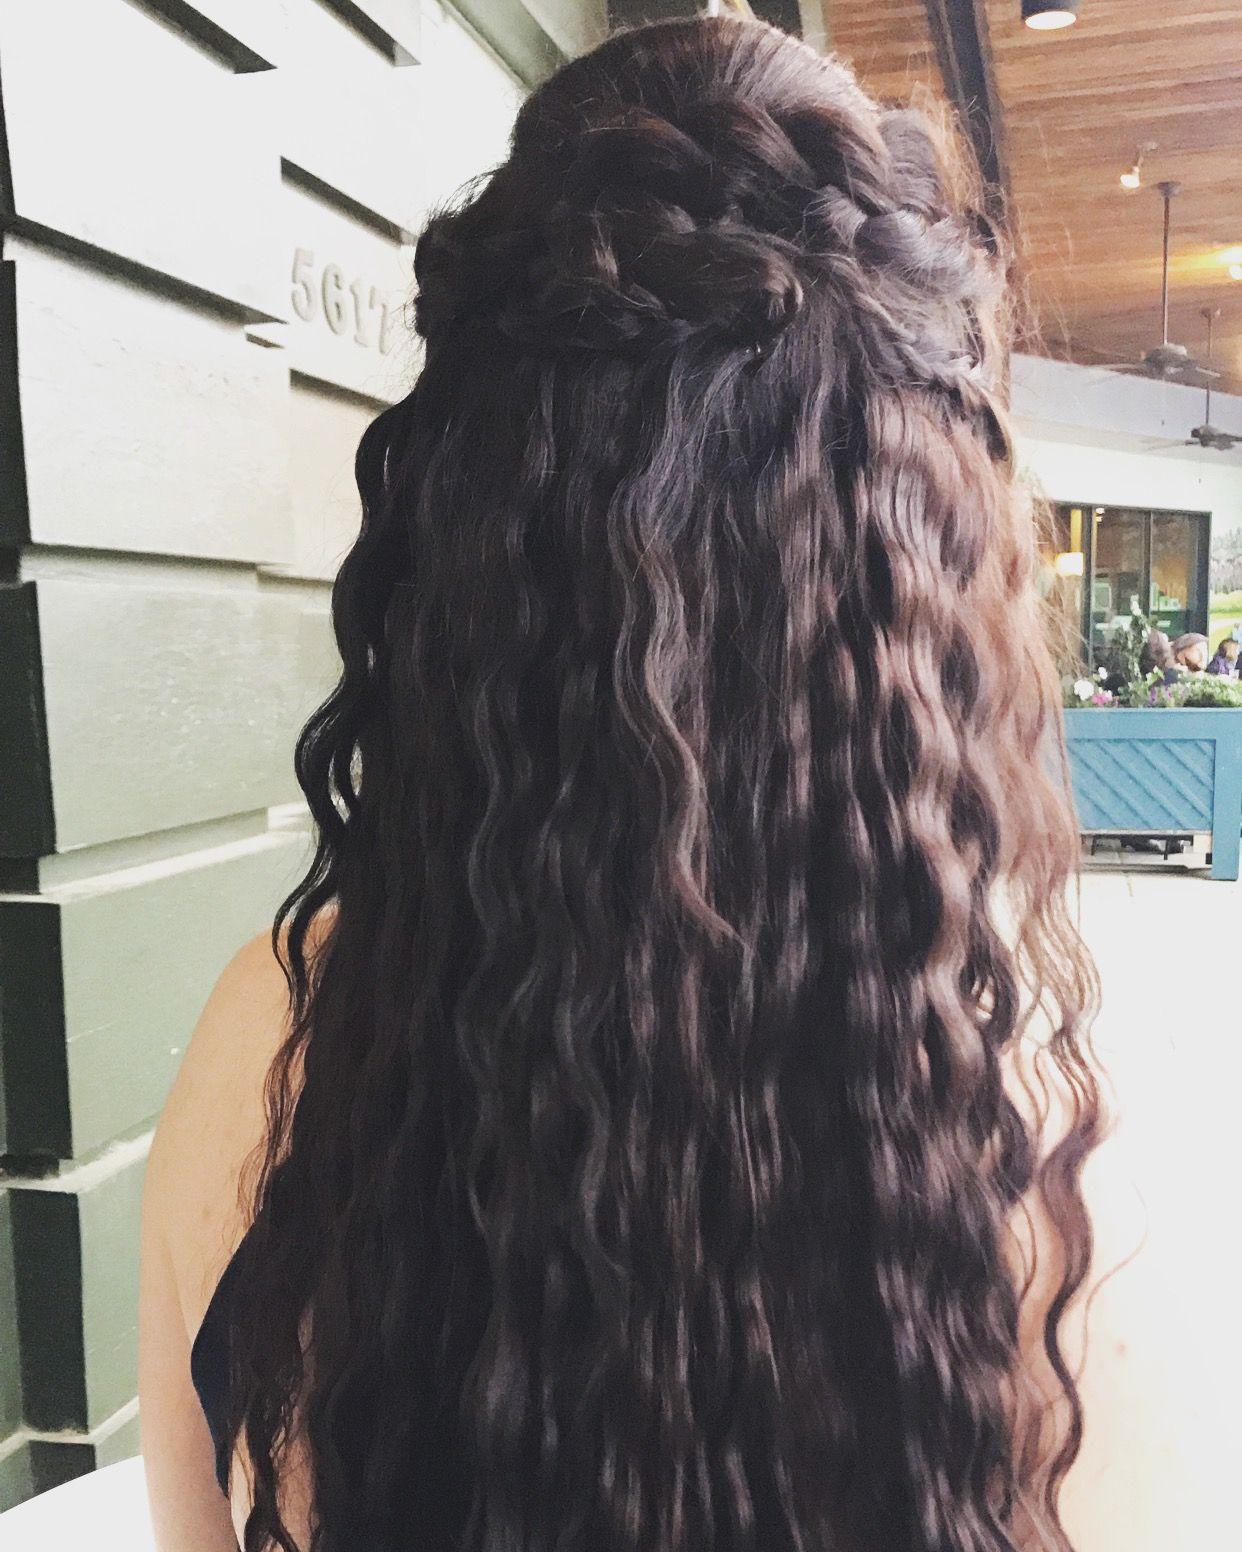 half up half down prom hairdo 💕 crimping isn't just a bad